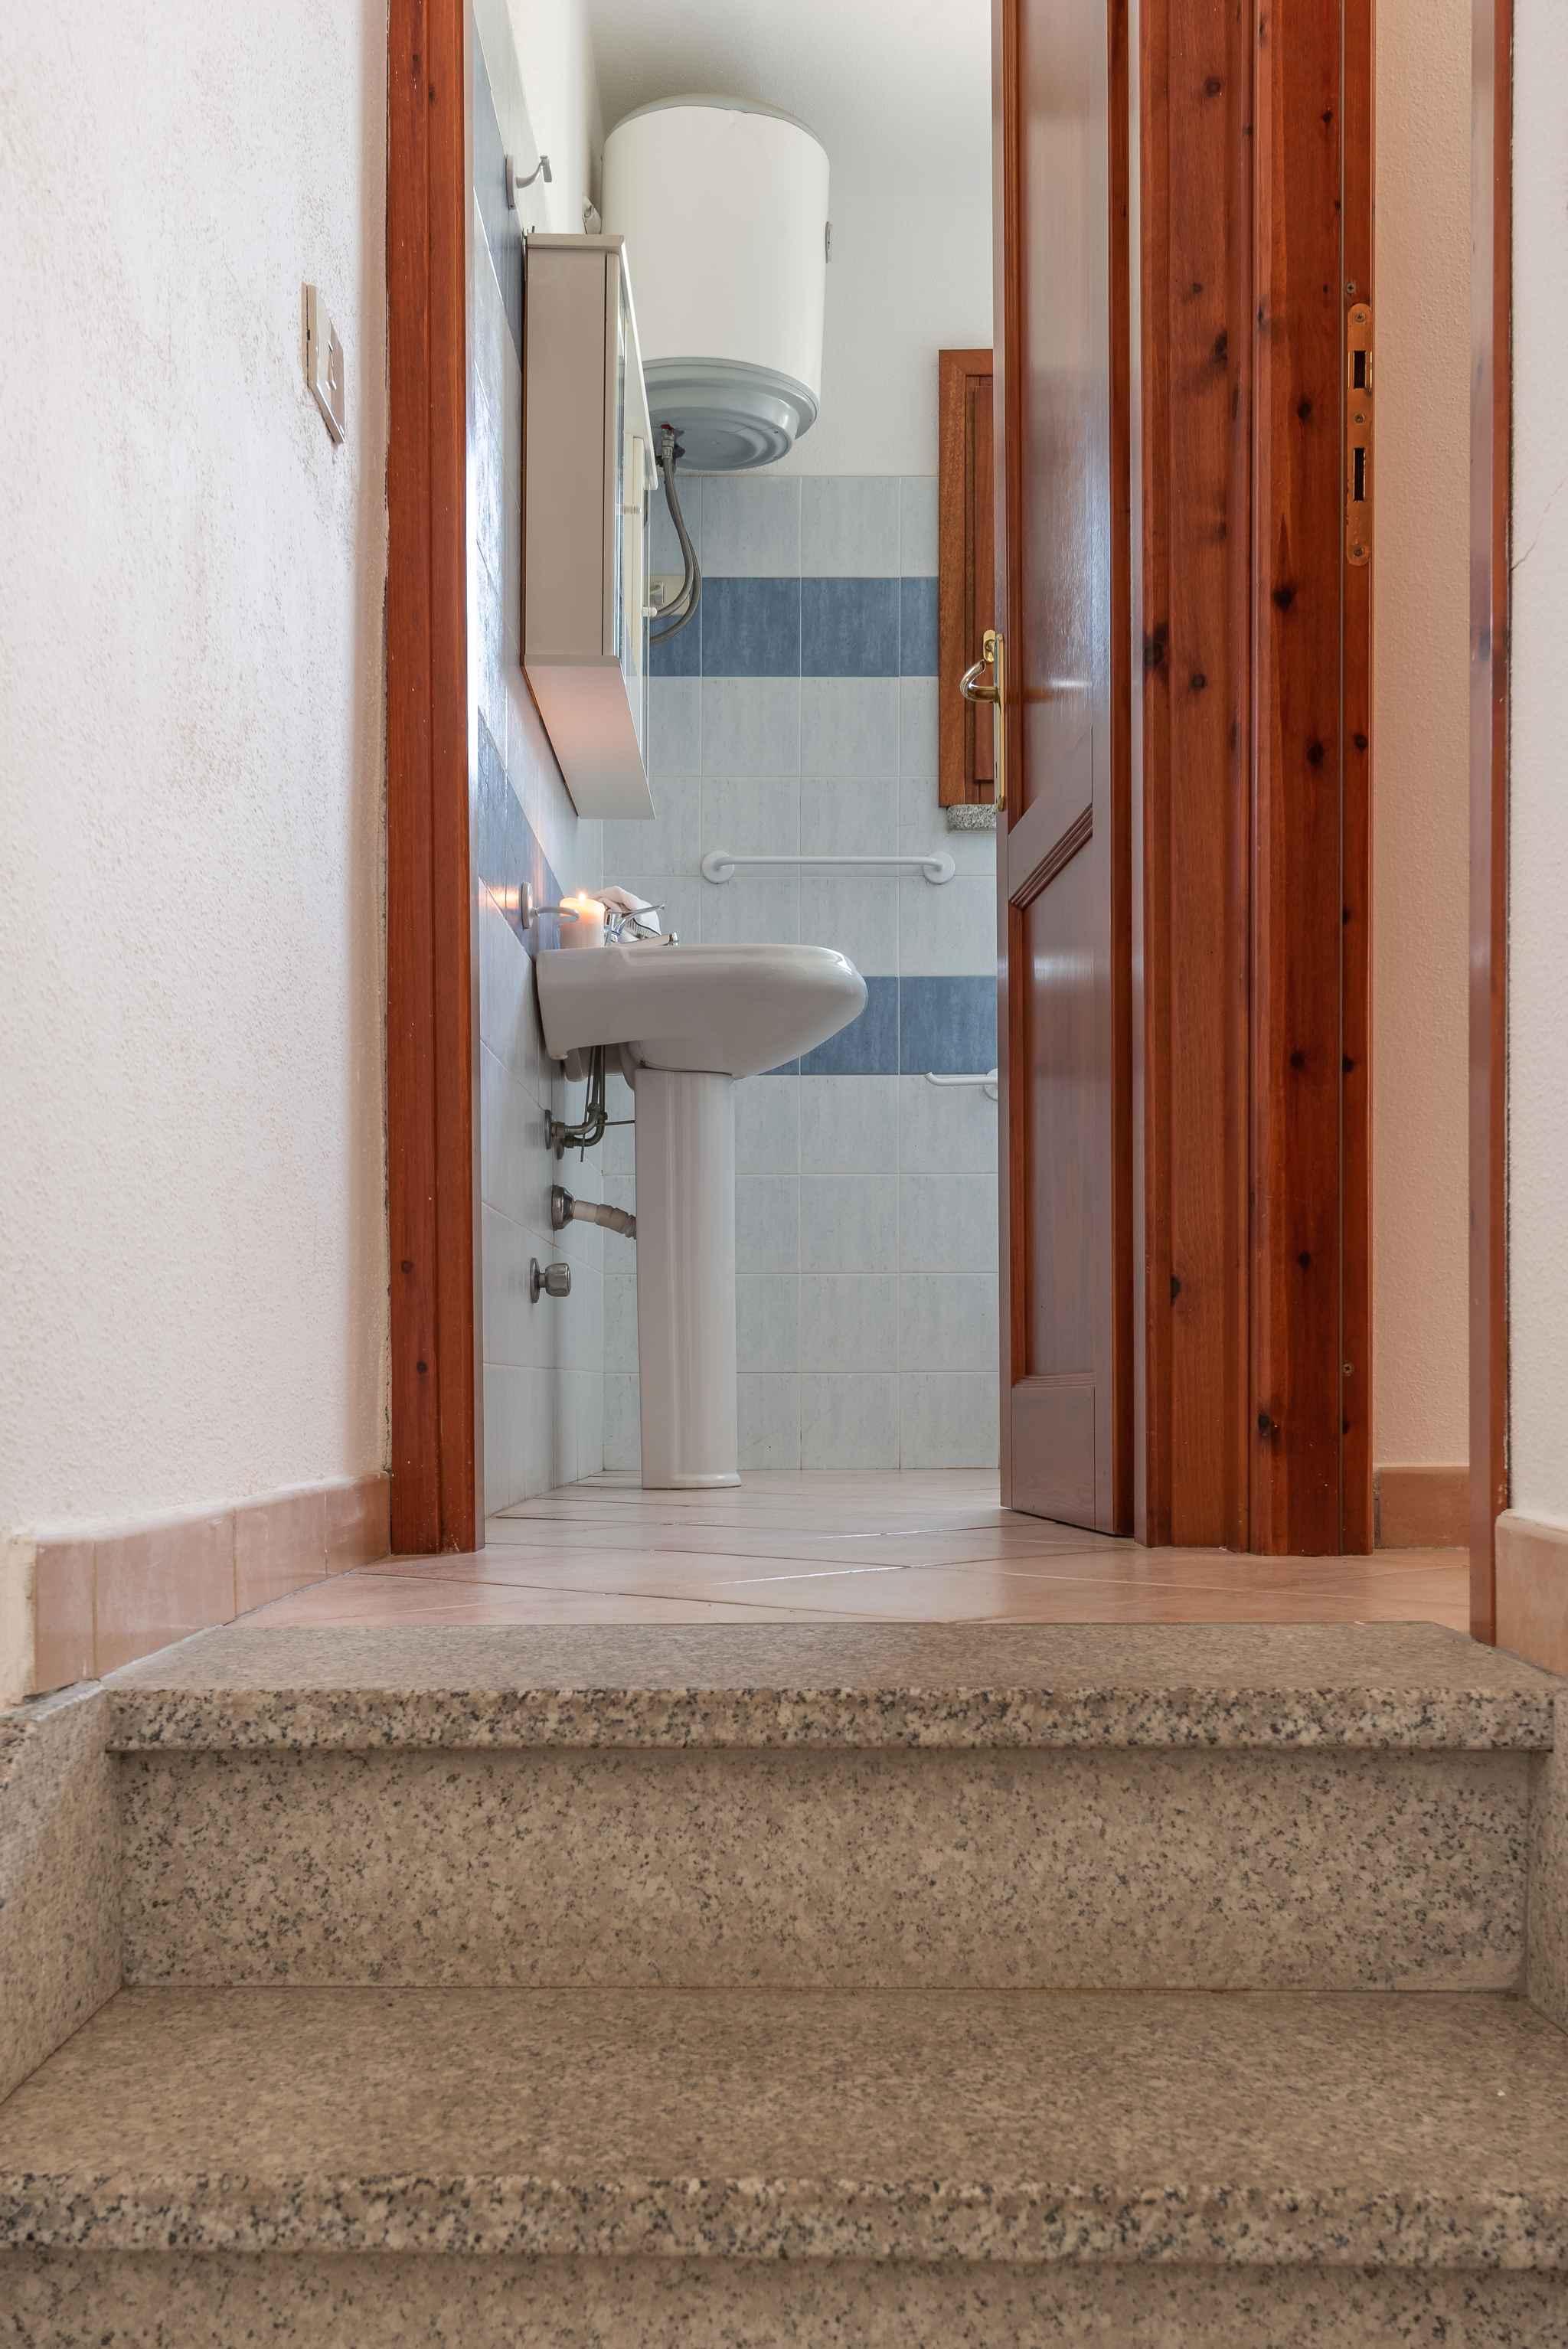 Ferienwohnung Appartamento 6 persone (2853261), Budoni, Olbia-Tempio, Sardinien, Italien, Bild 8